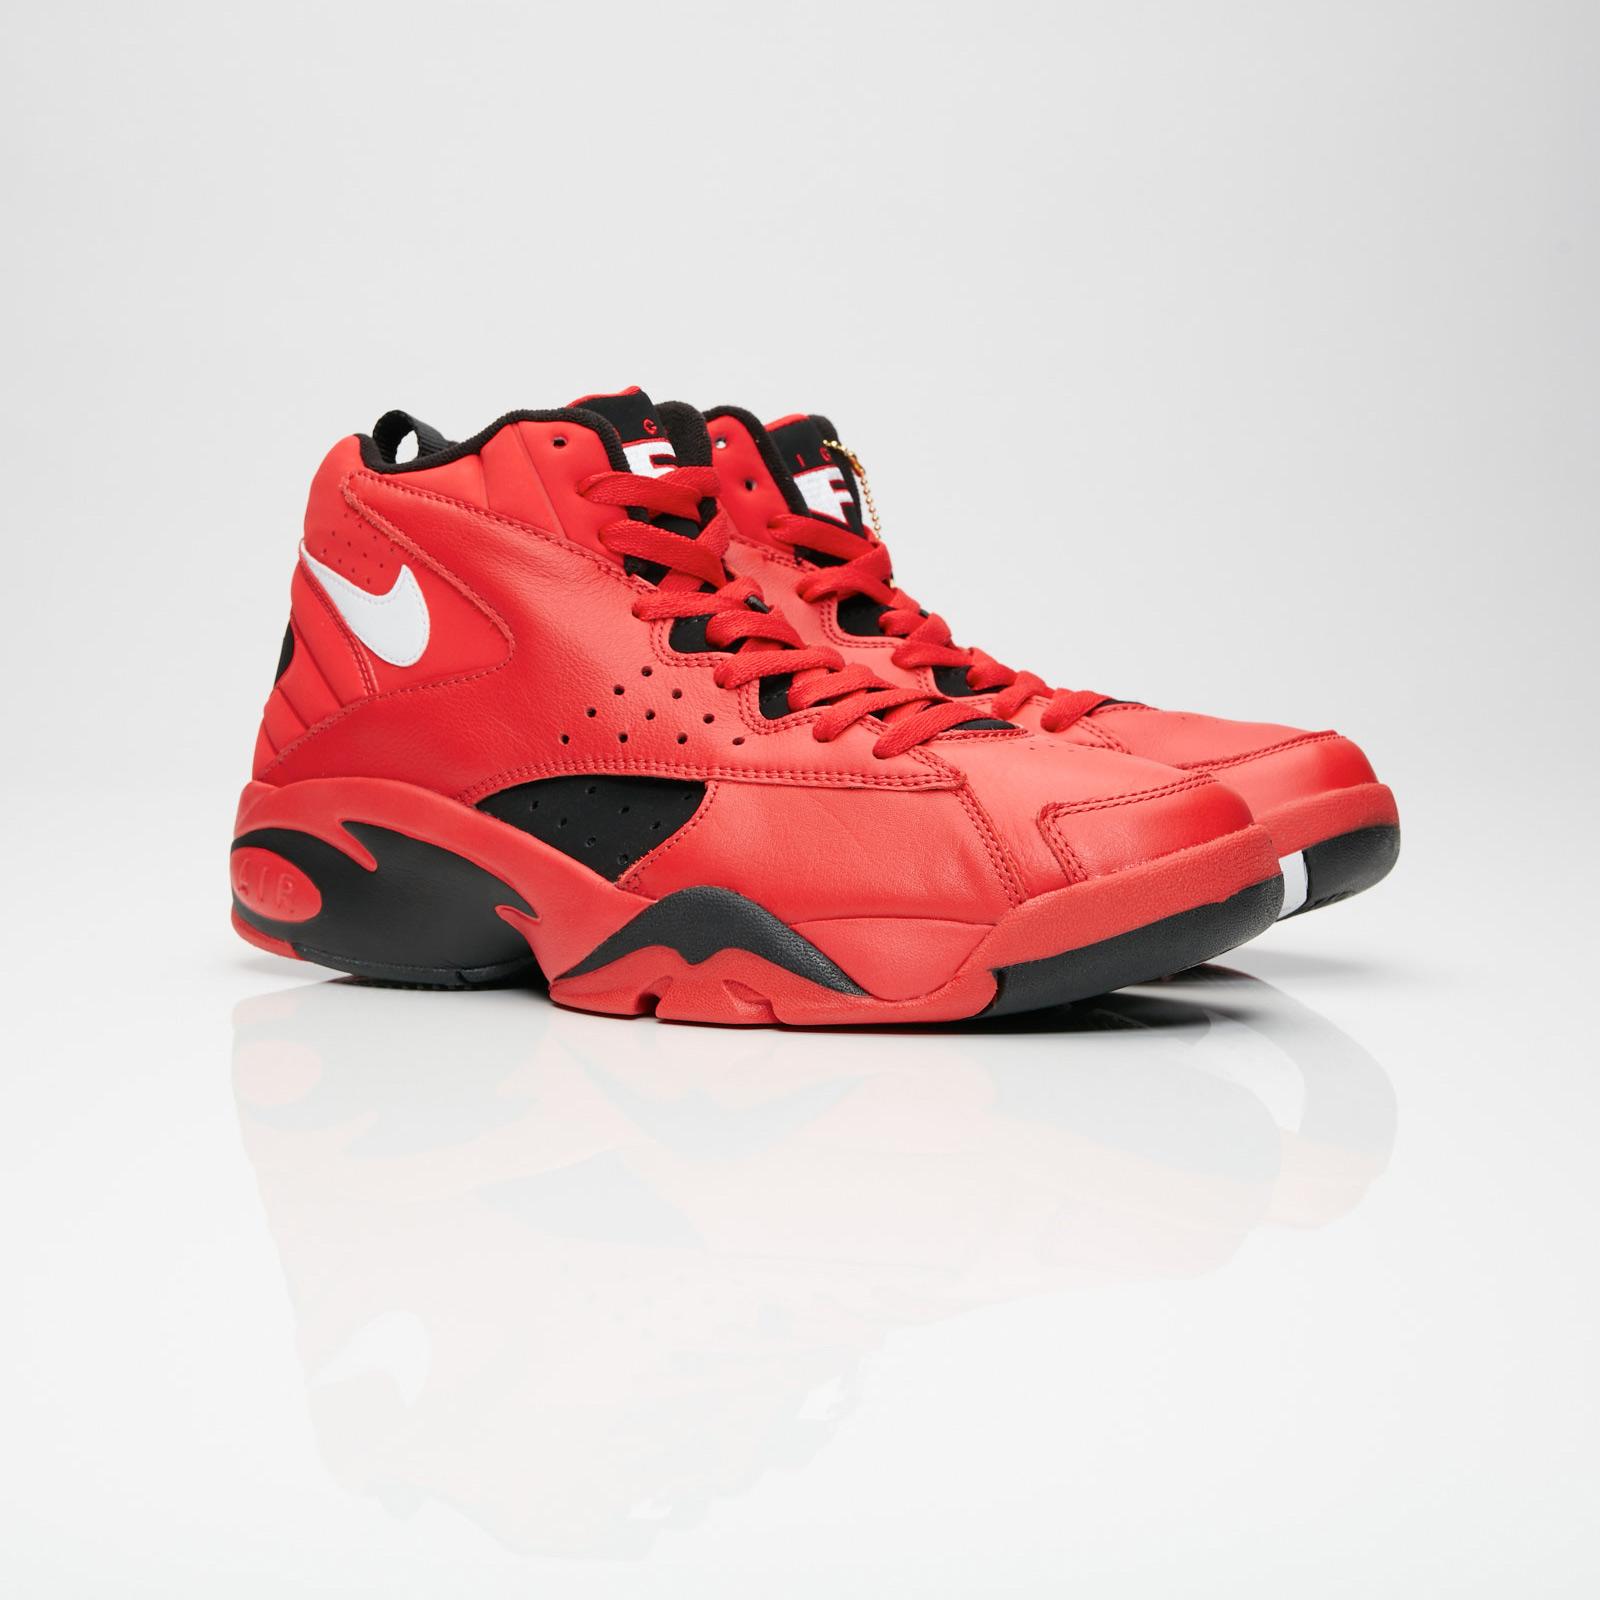 Nike Air Maestro II QS - Aj9281-600 - Sneakersnstuff  02c418ed8